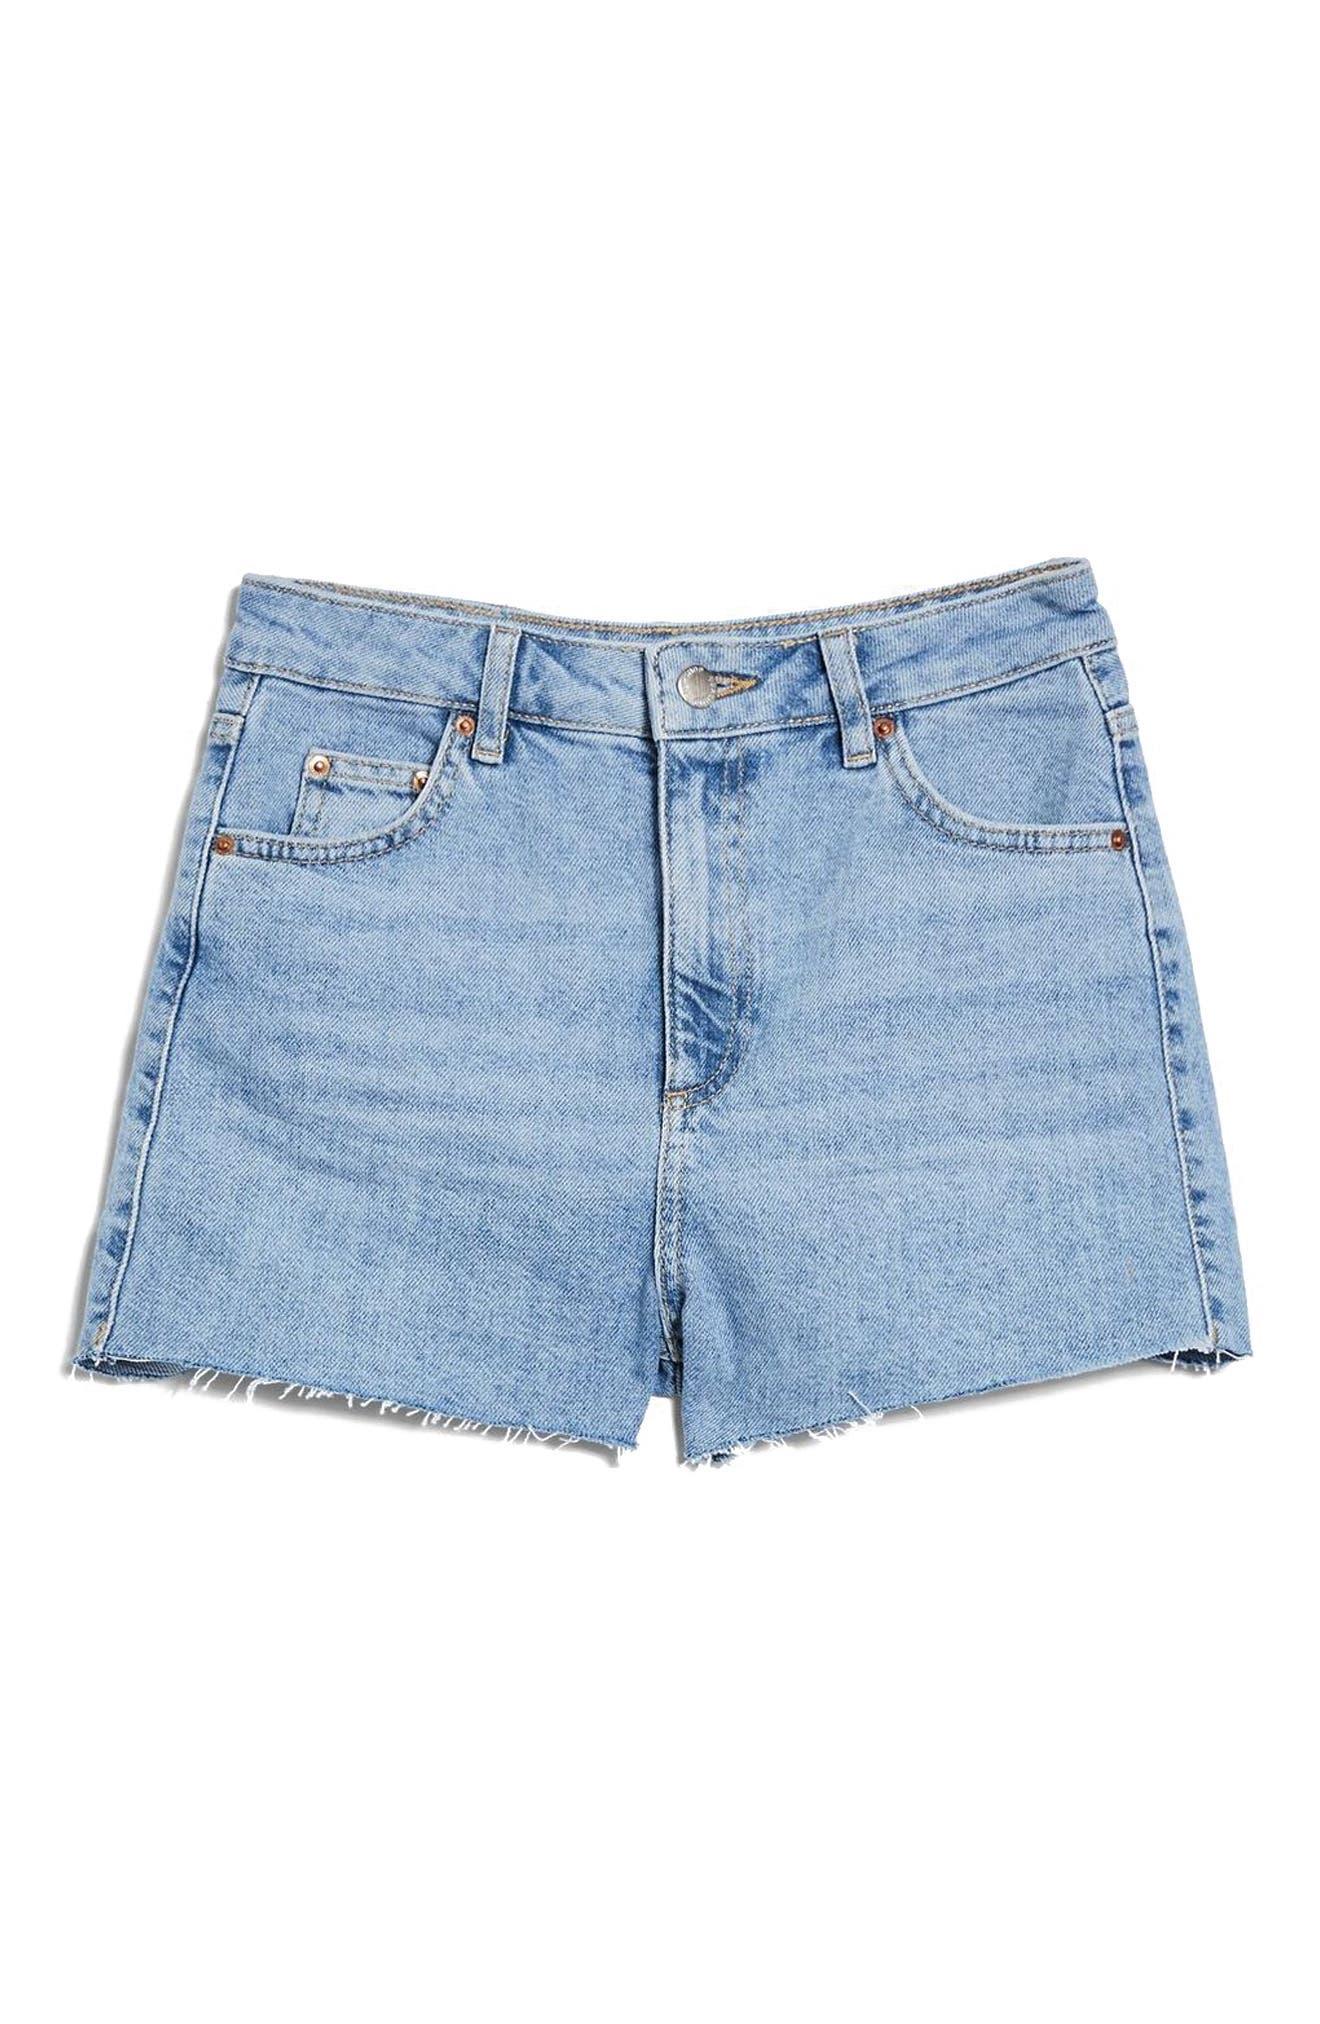 Denim Mom Shorts,                             Alternate thumbnail 4, color,                             420